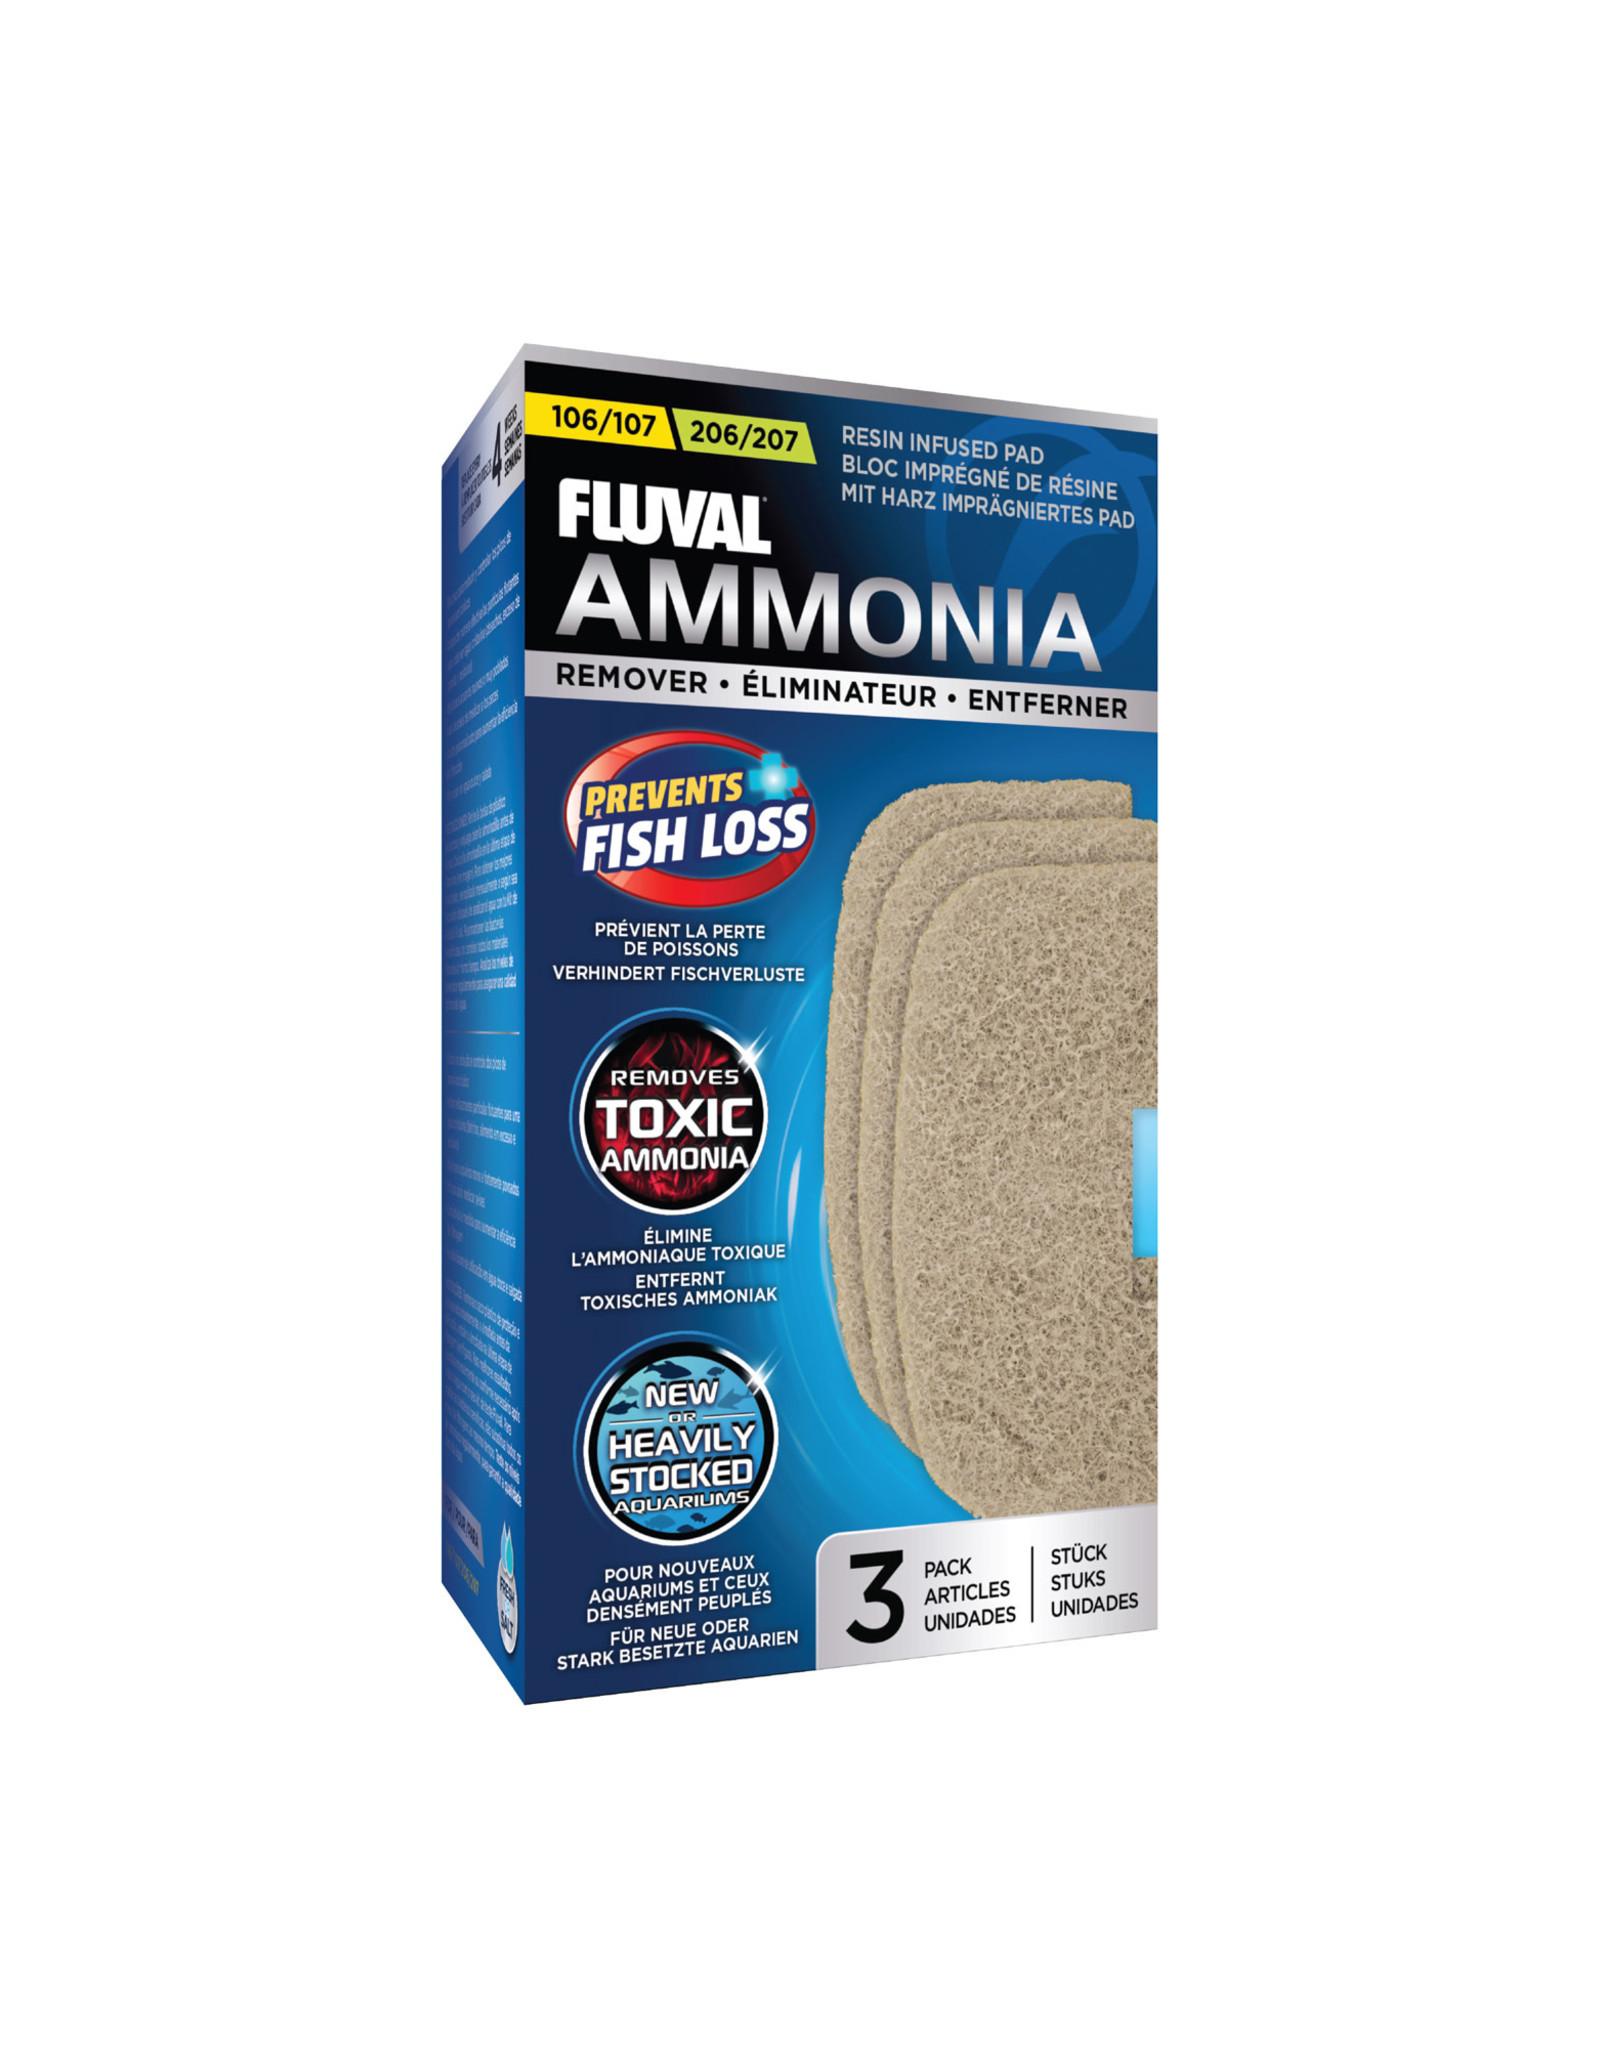 Fluval Fluval Ammonia 106107 /206207